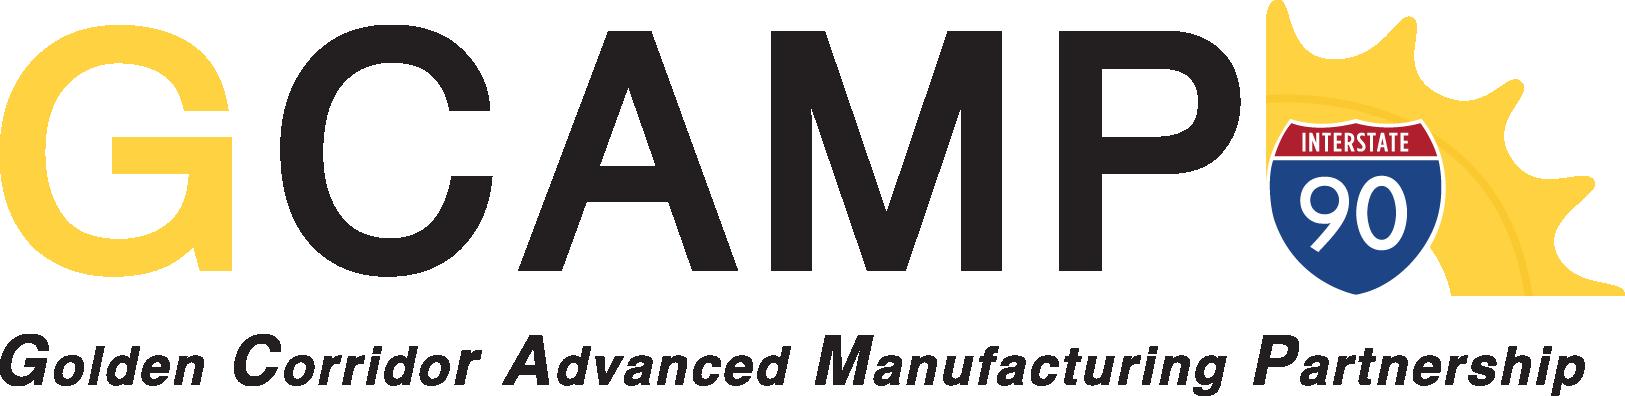 GCAMP-LogoPNG.png